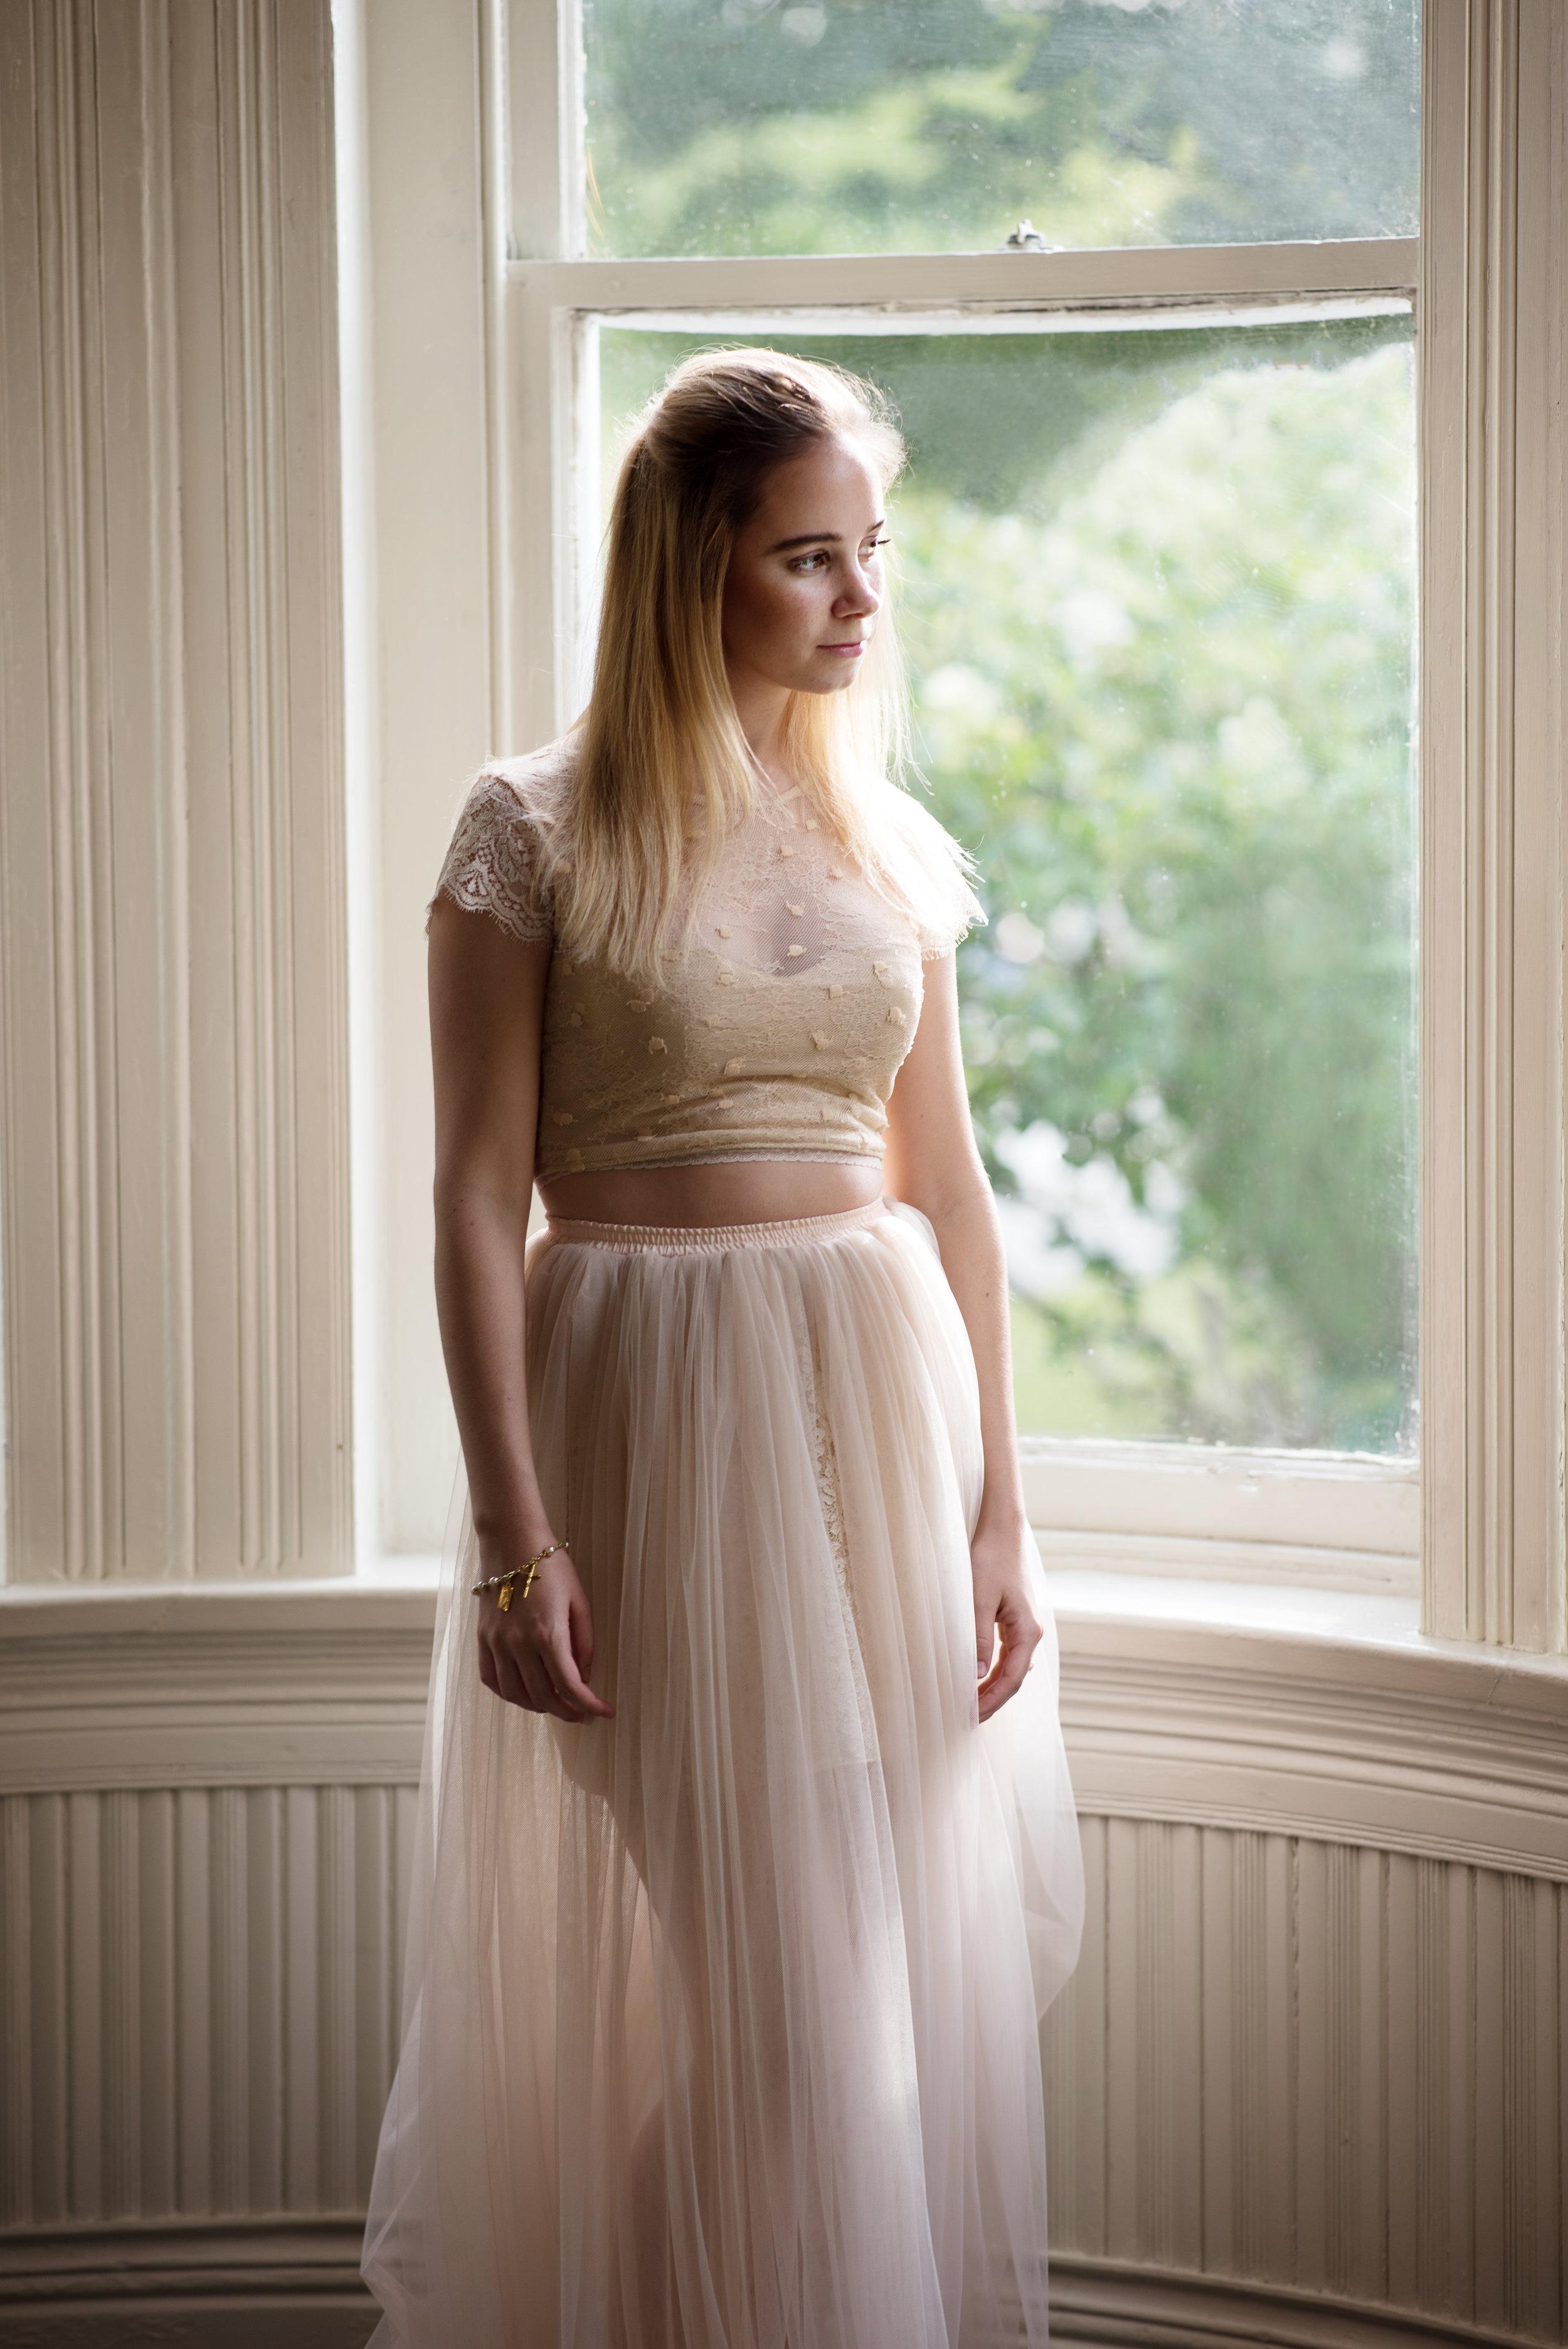 Frederick Maryland Bridal dresses